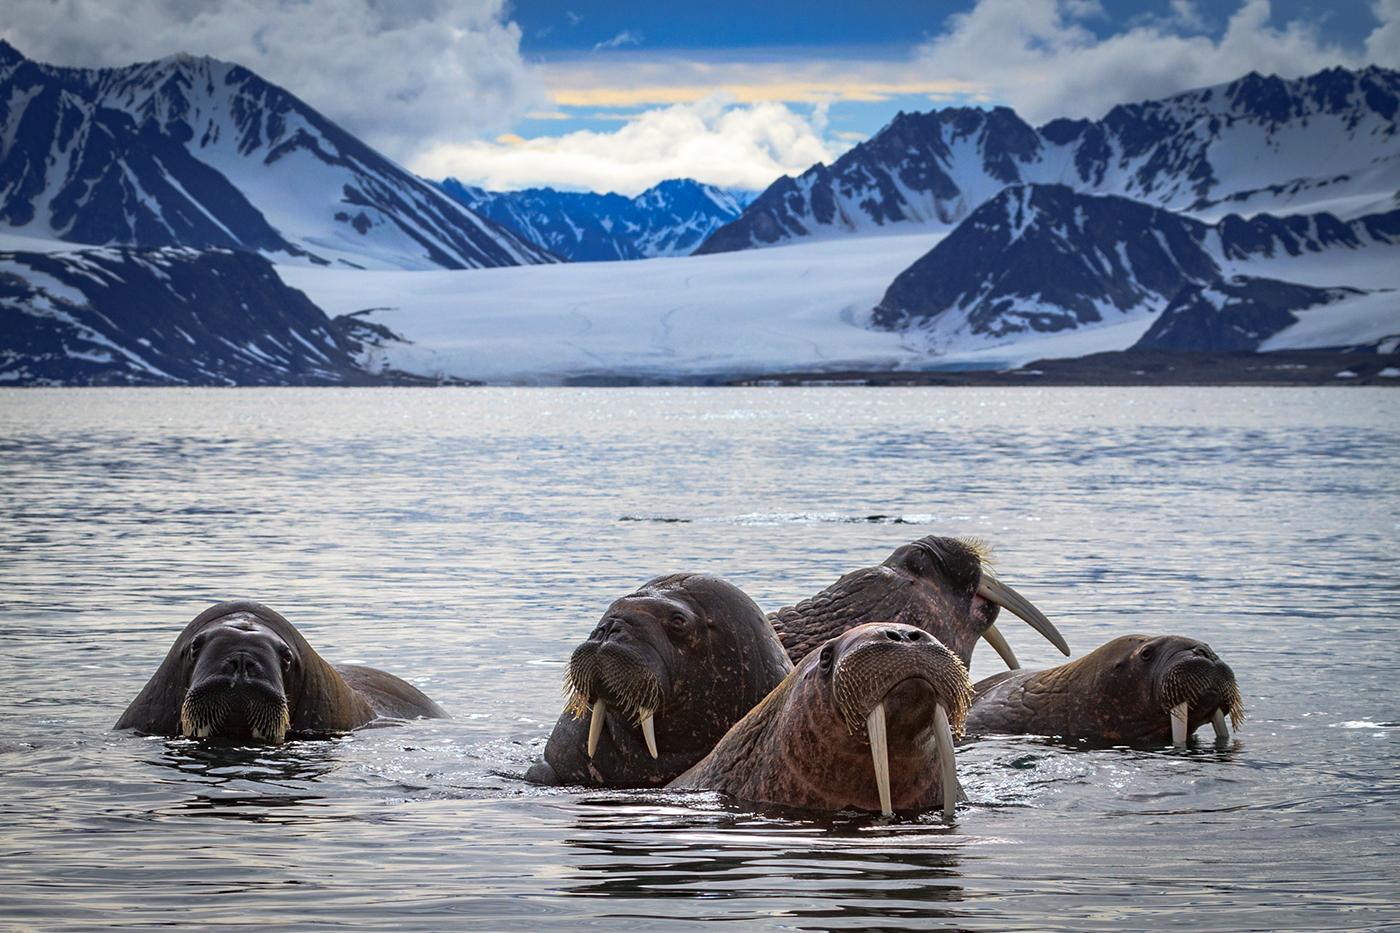 polar regions Arctic antarctic antarctica Svalbard wilderness Landscape wildlife